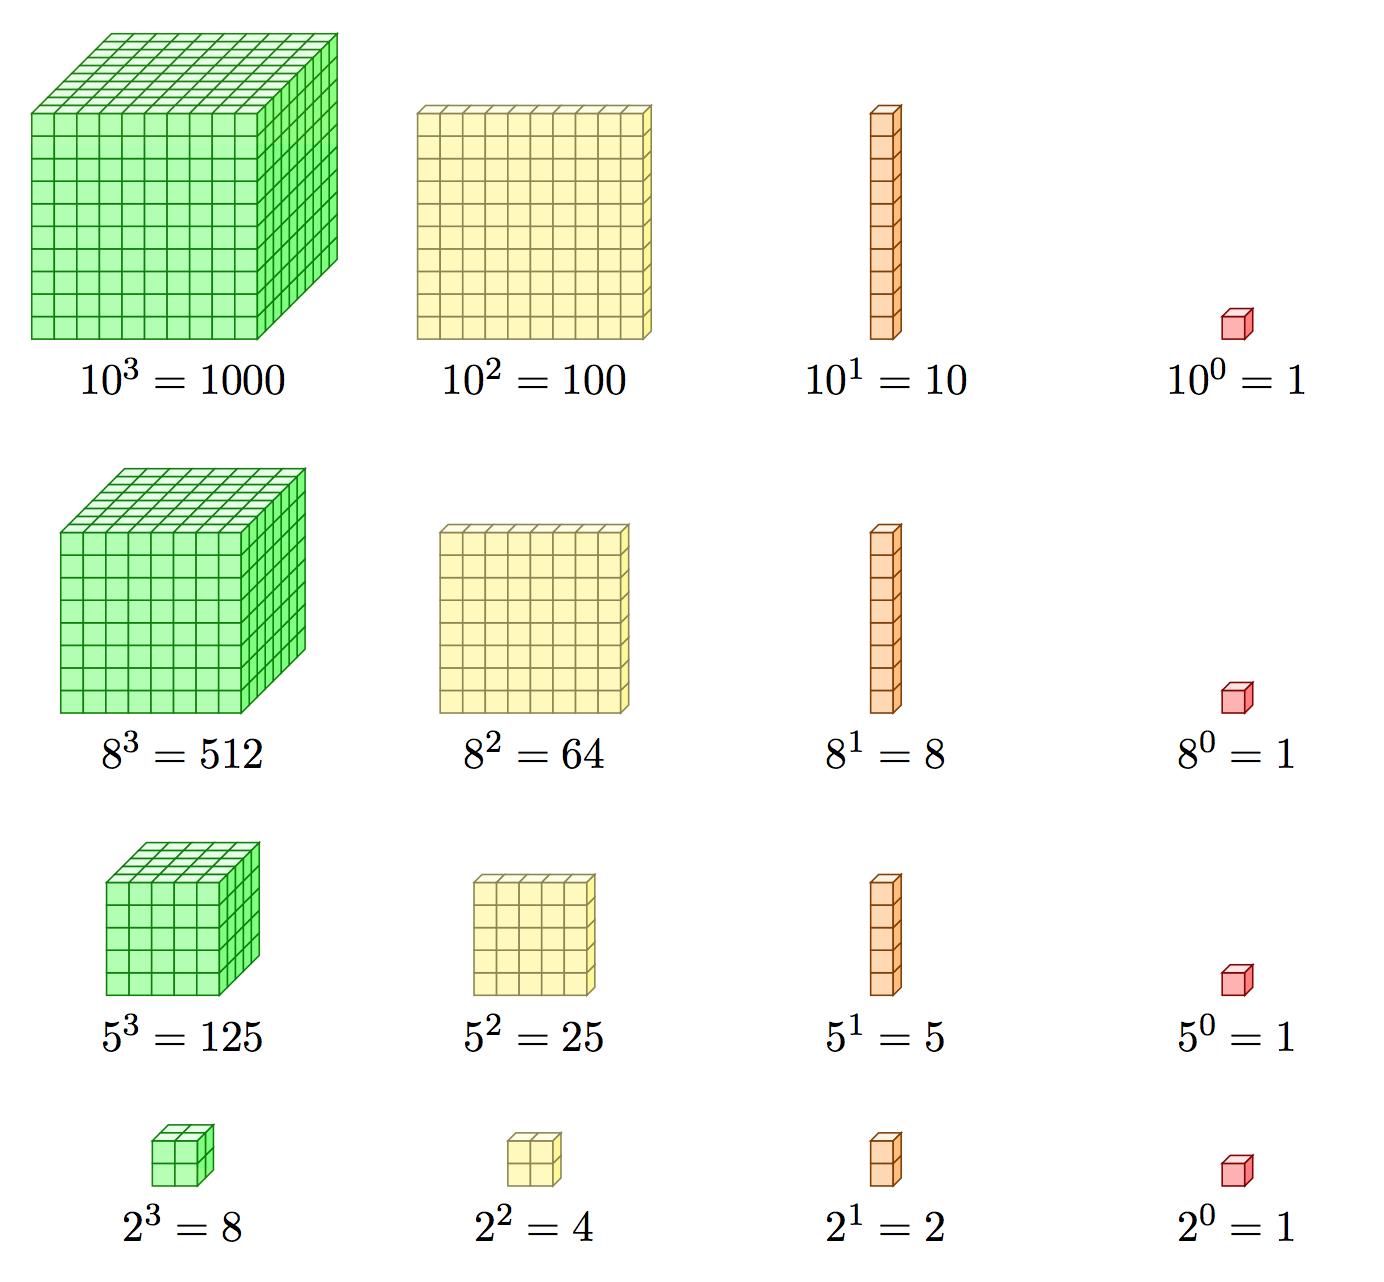 Image4_GameMath_0626.png